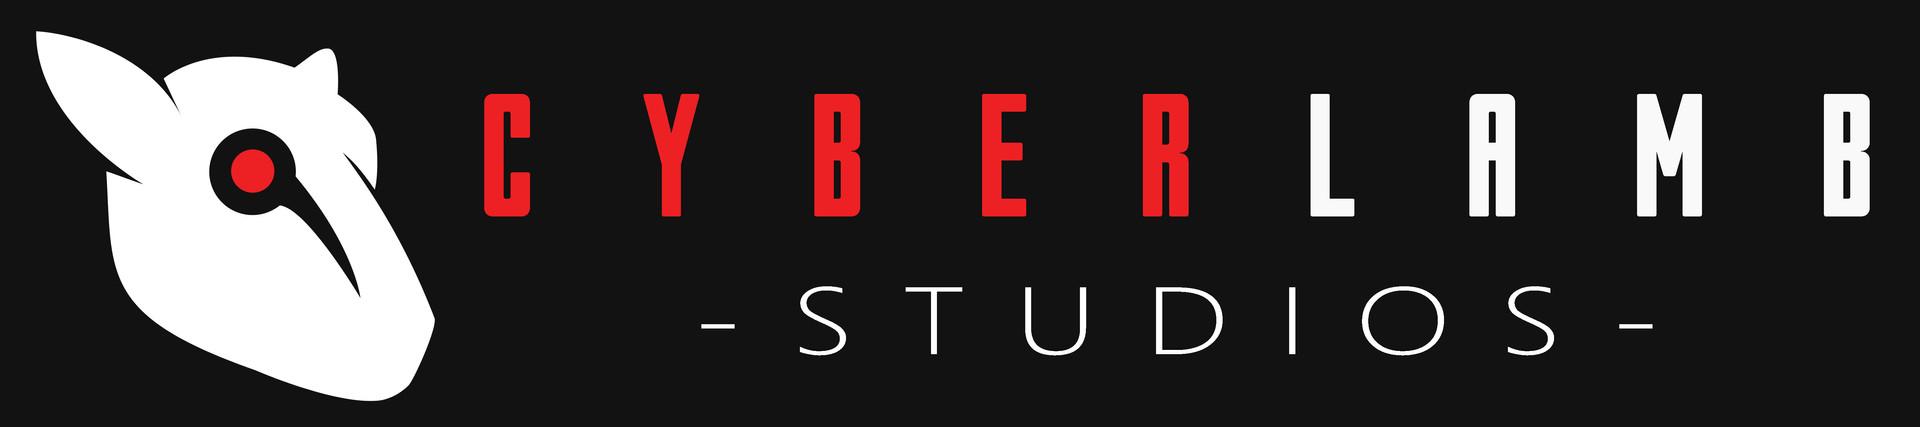 Cyberlamb Studios Logo